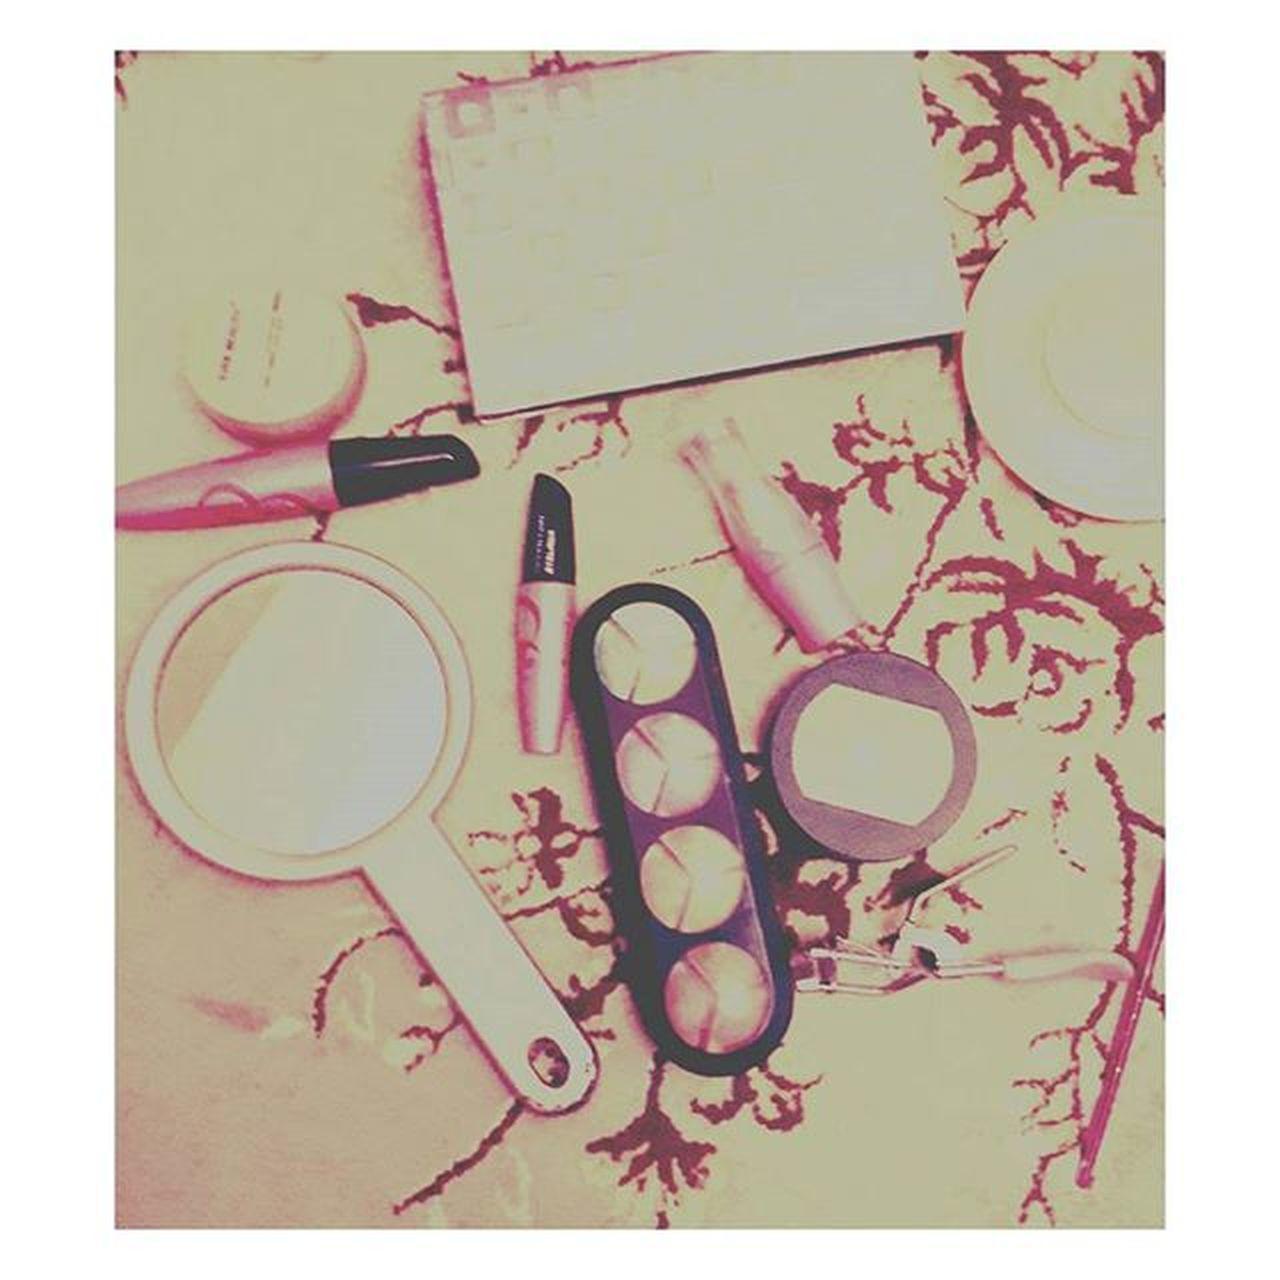 MakeUp Collection (=^ ^=) !! ▶ @hashgramapp Makeup Instamakeup Cosmetic Cosmetics Hashgram Banoosh Fashion Eyeshadow Lipstick Gloss Mascara Palettes Eyeliner Lip Lips Tar Concealer Foundation Powder Eyes Eyebrows Lashes Lash Glue Glitter crease primers base beauty beautiful beautiful